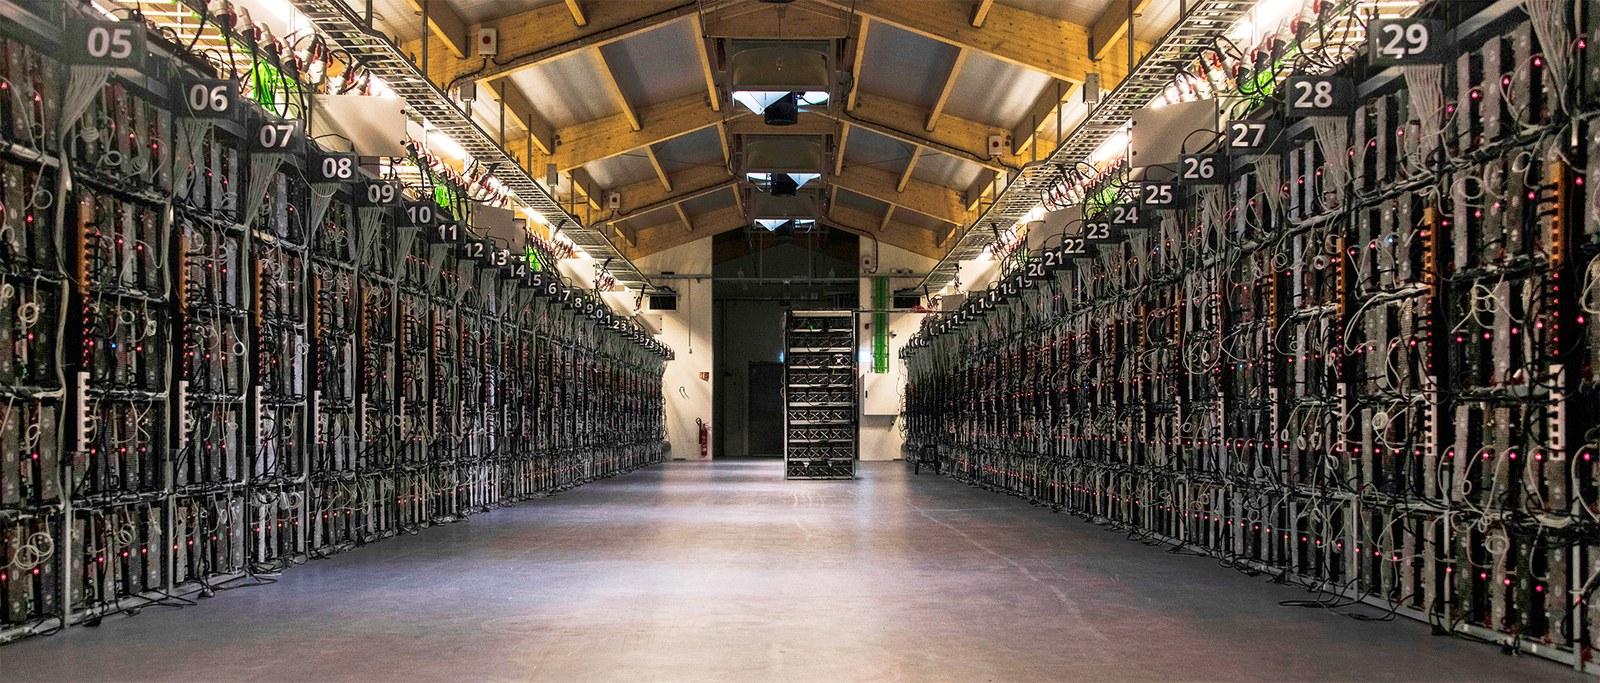 bitcoin-heist-1219-embed01